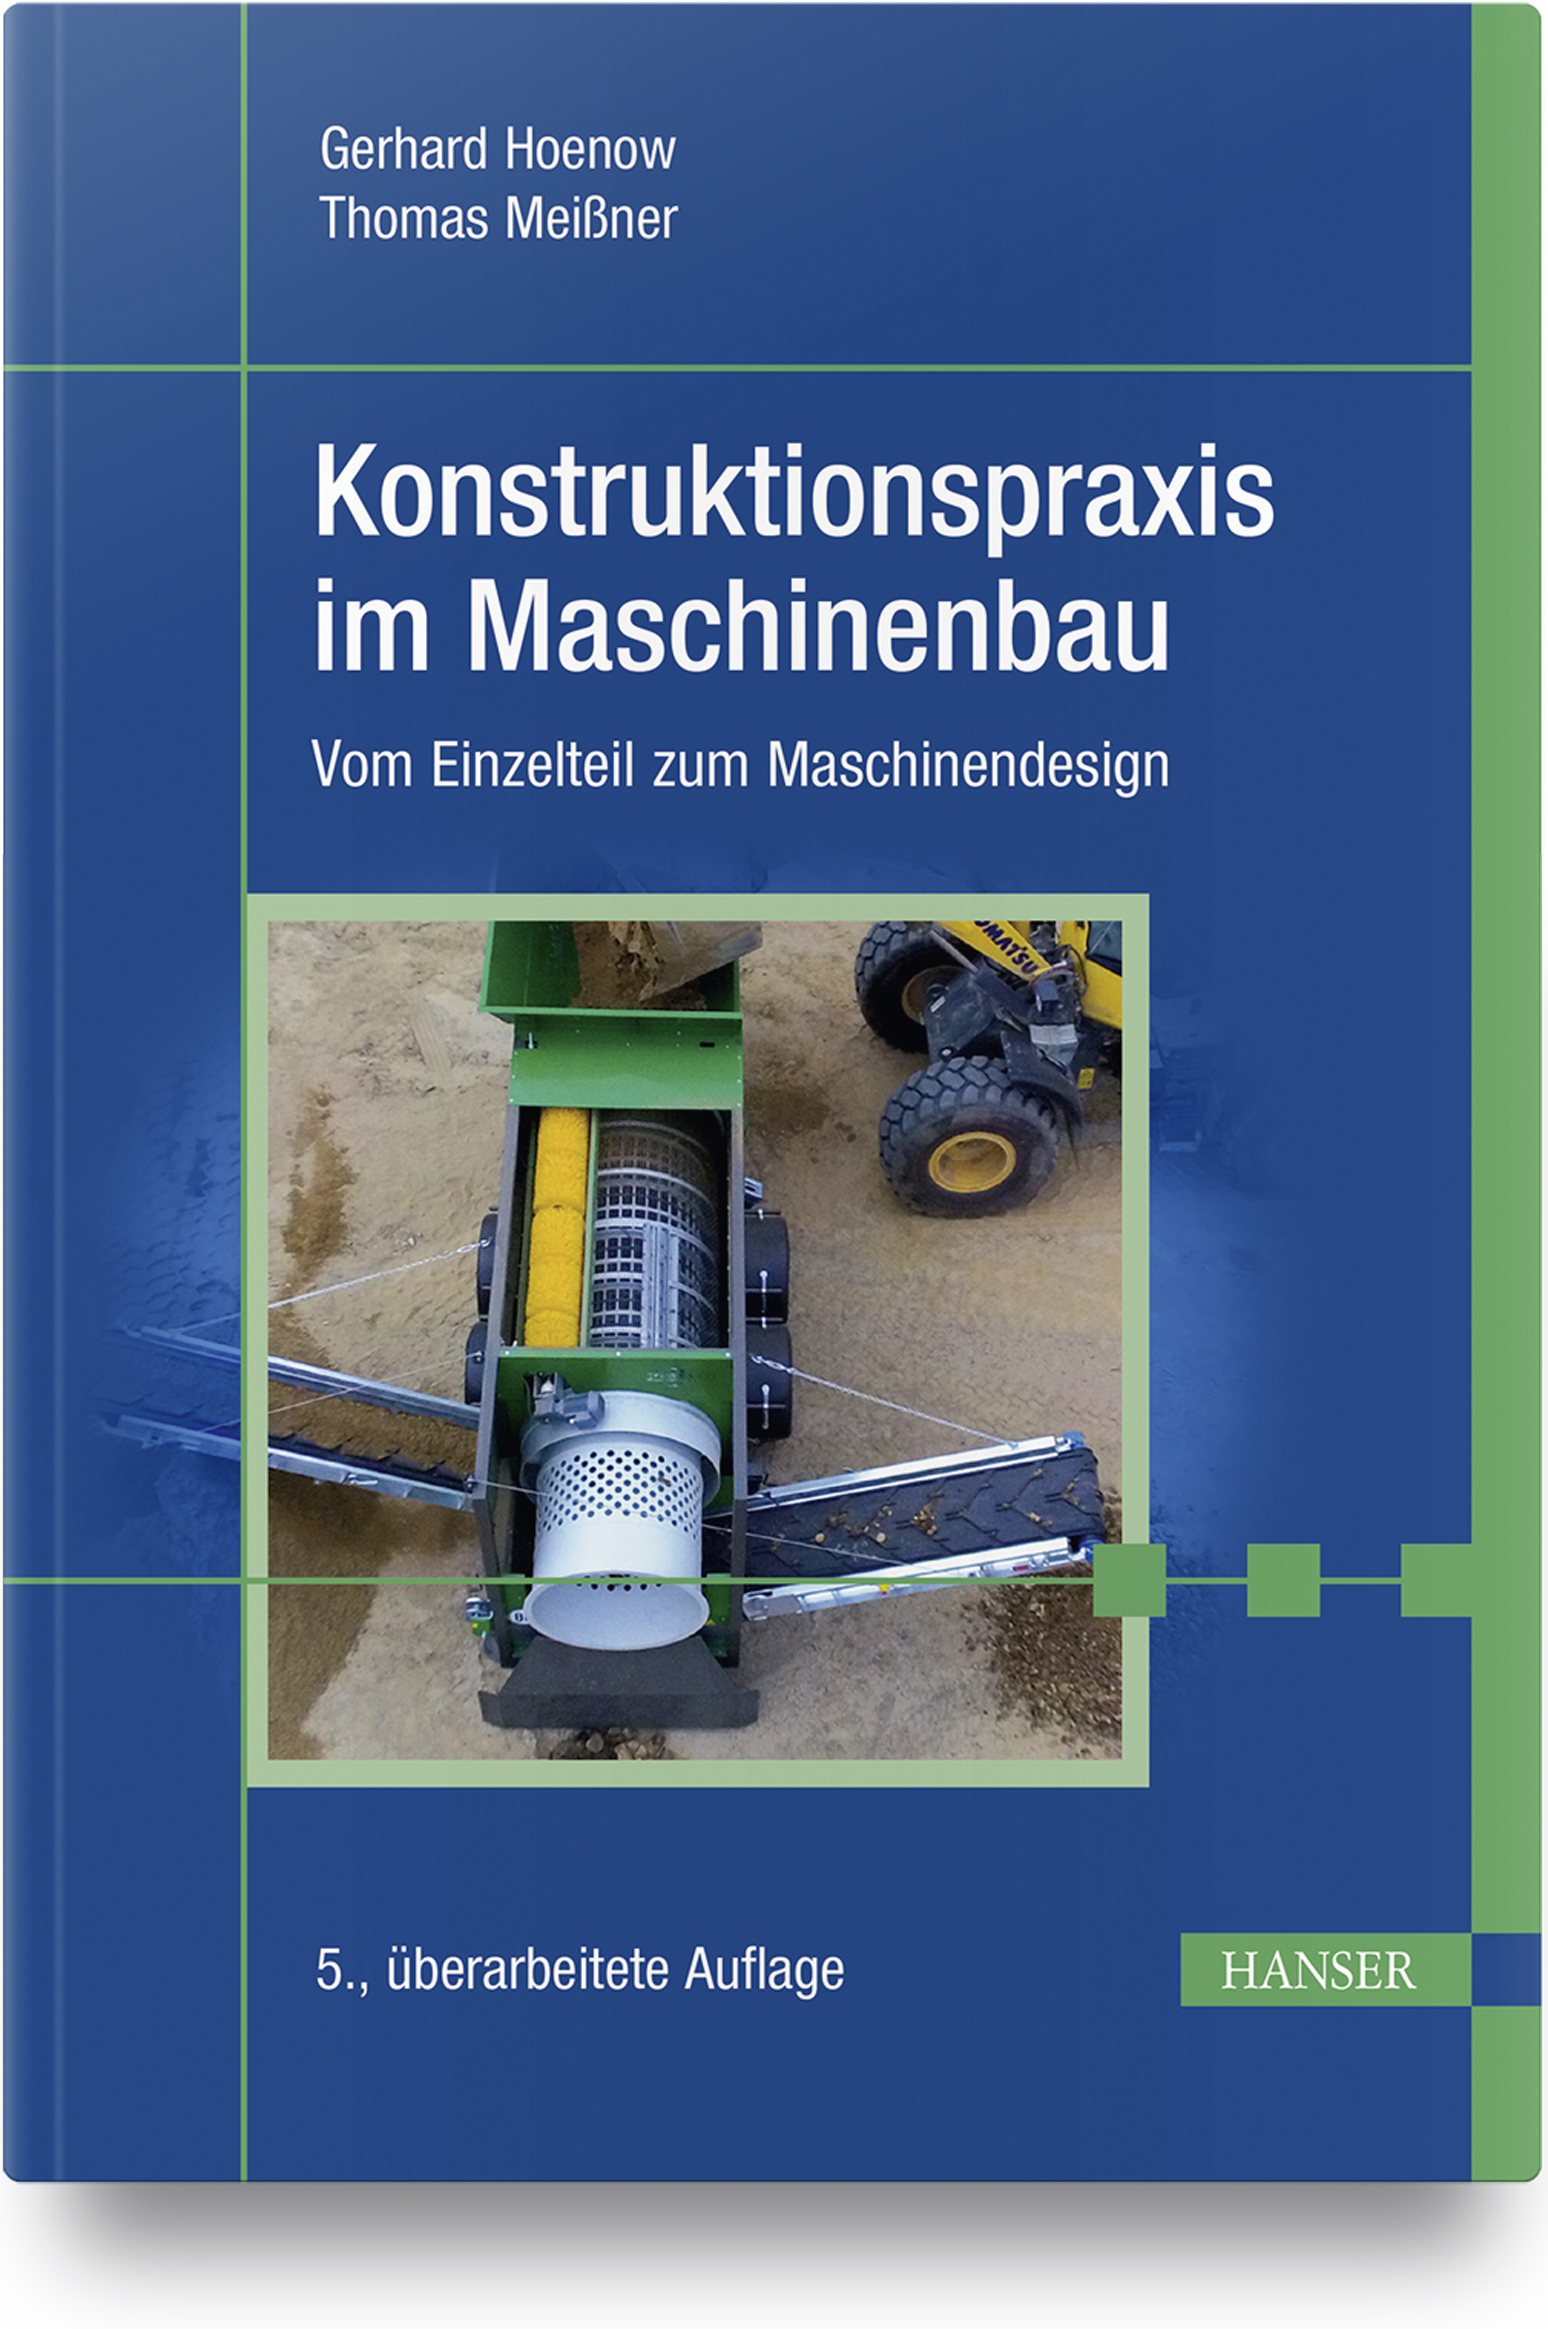 Hoenow, Meißner, Konstruktionspraxis im Maschinenbau, 978-3-446-46485-8